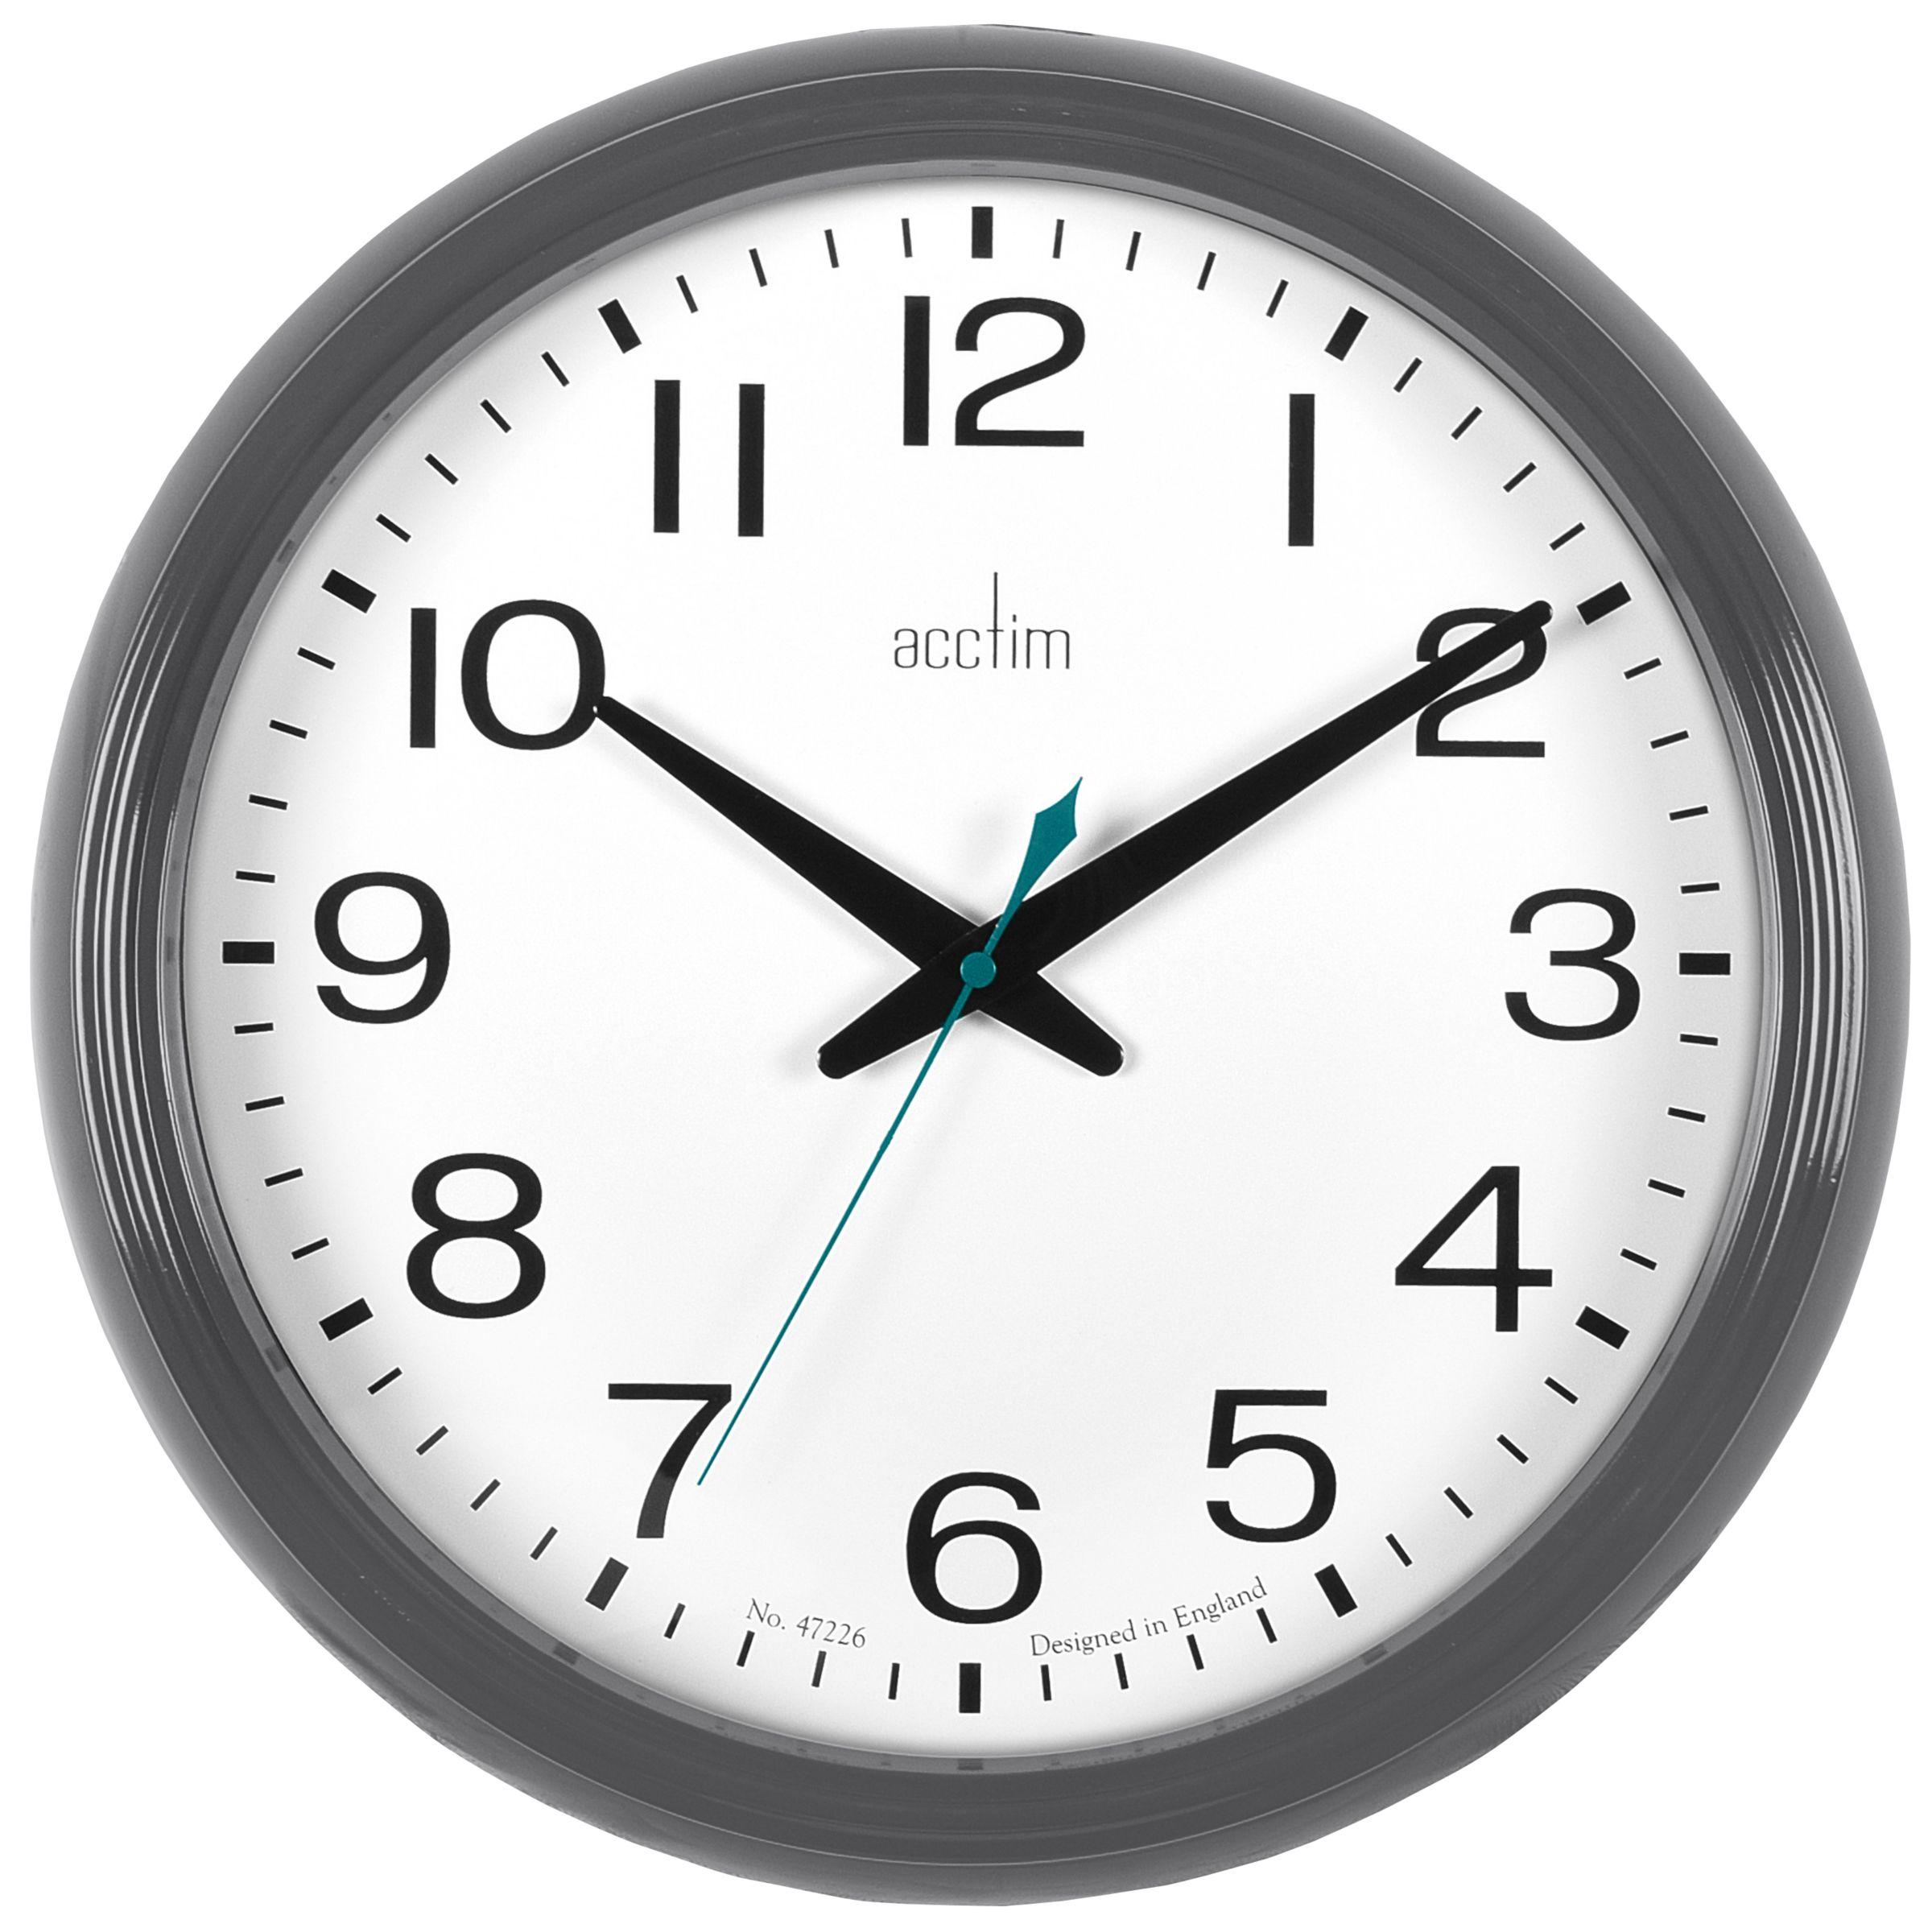 Acctim Acctim Penford Wall Clock, Dia.38cm